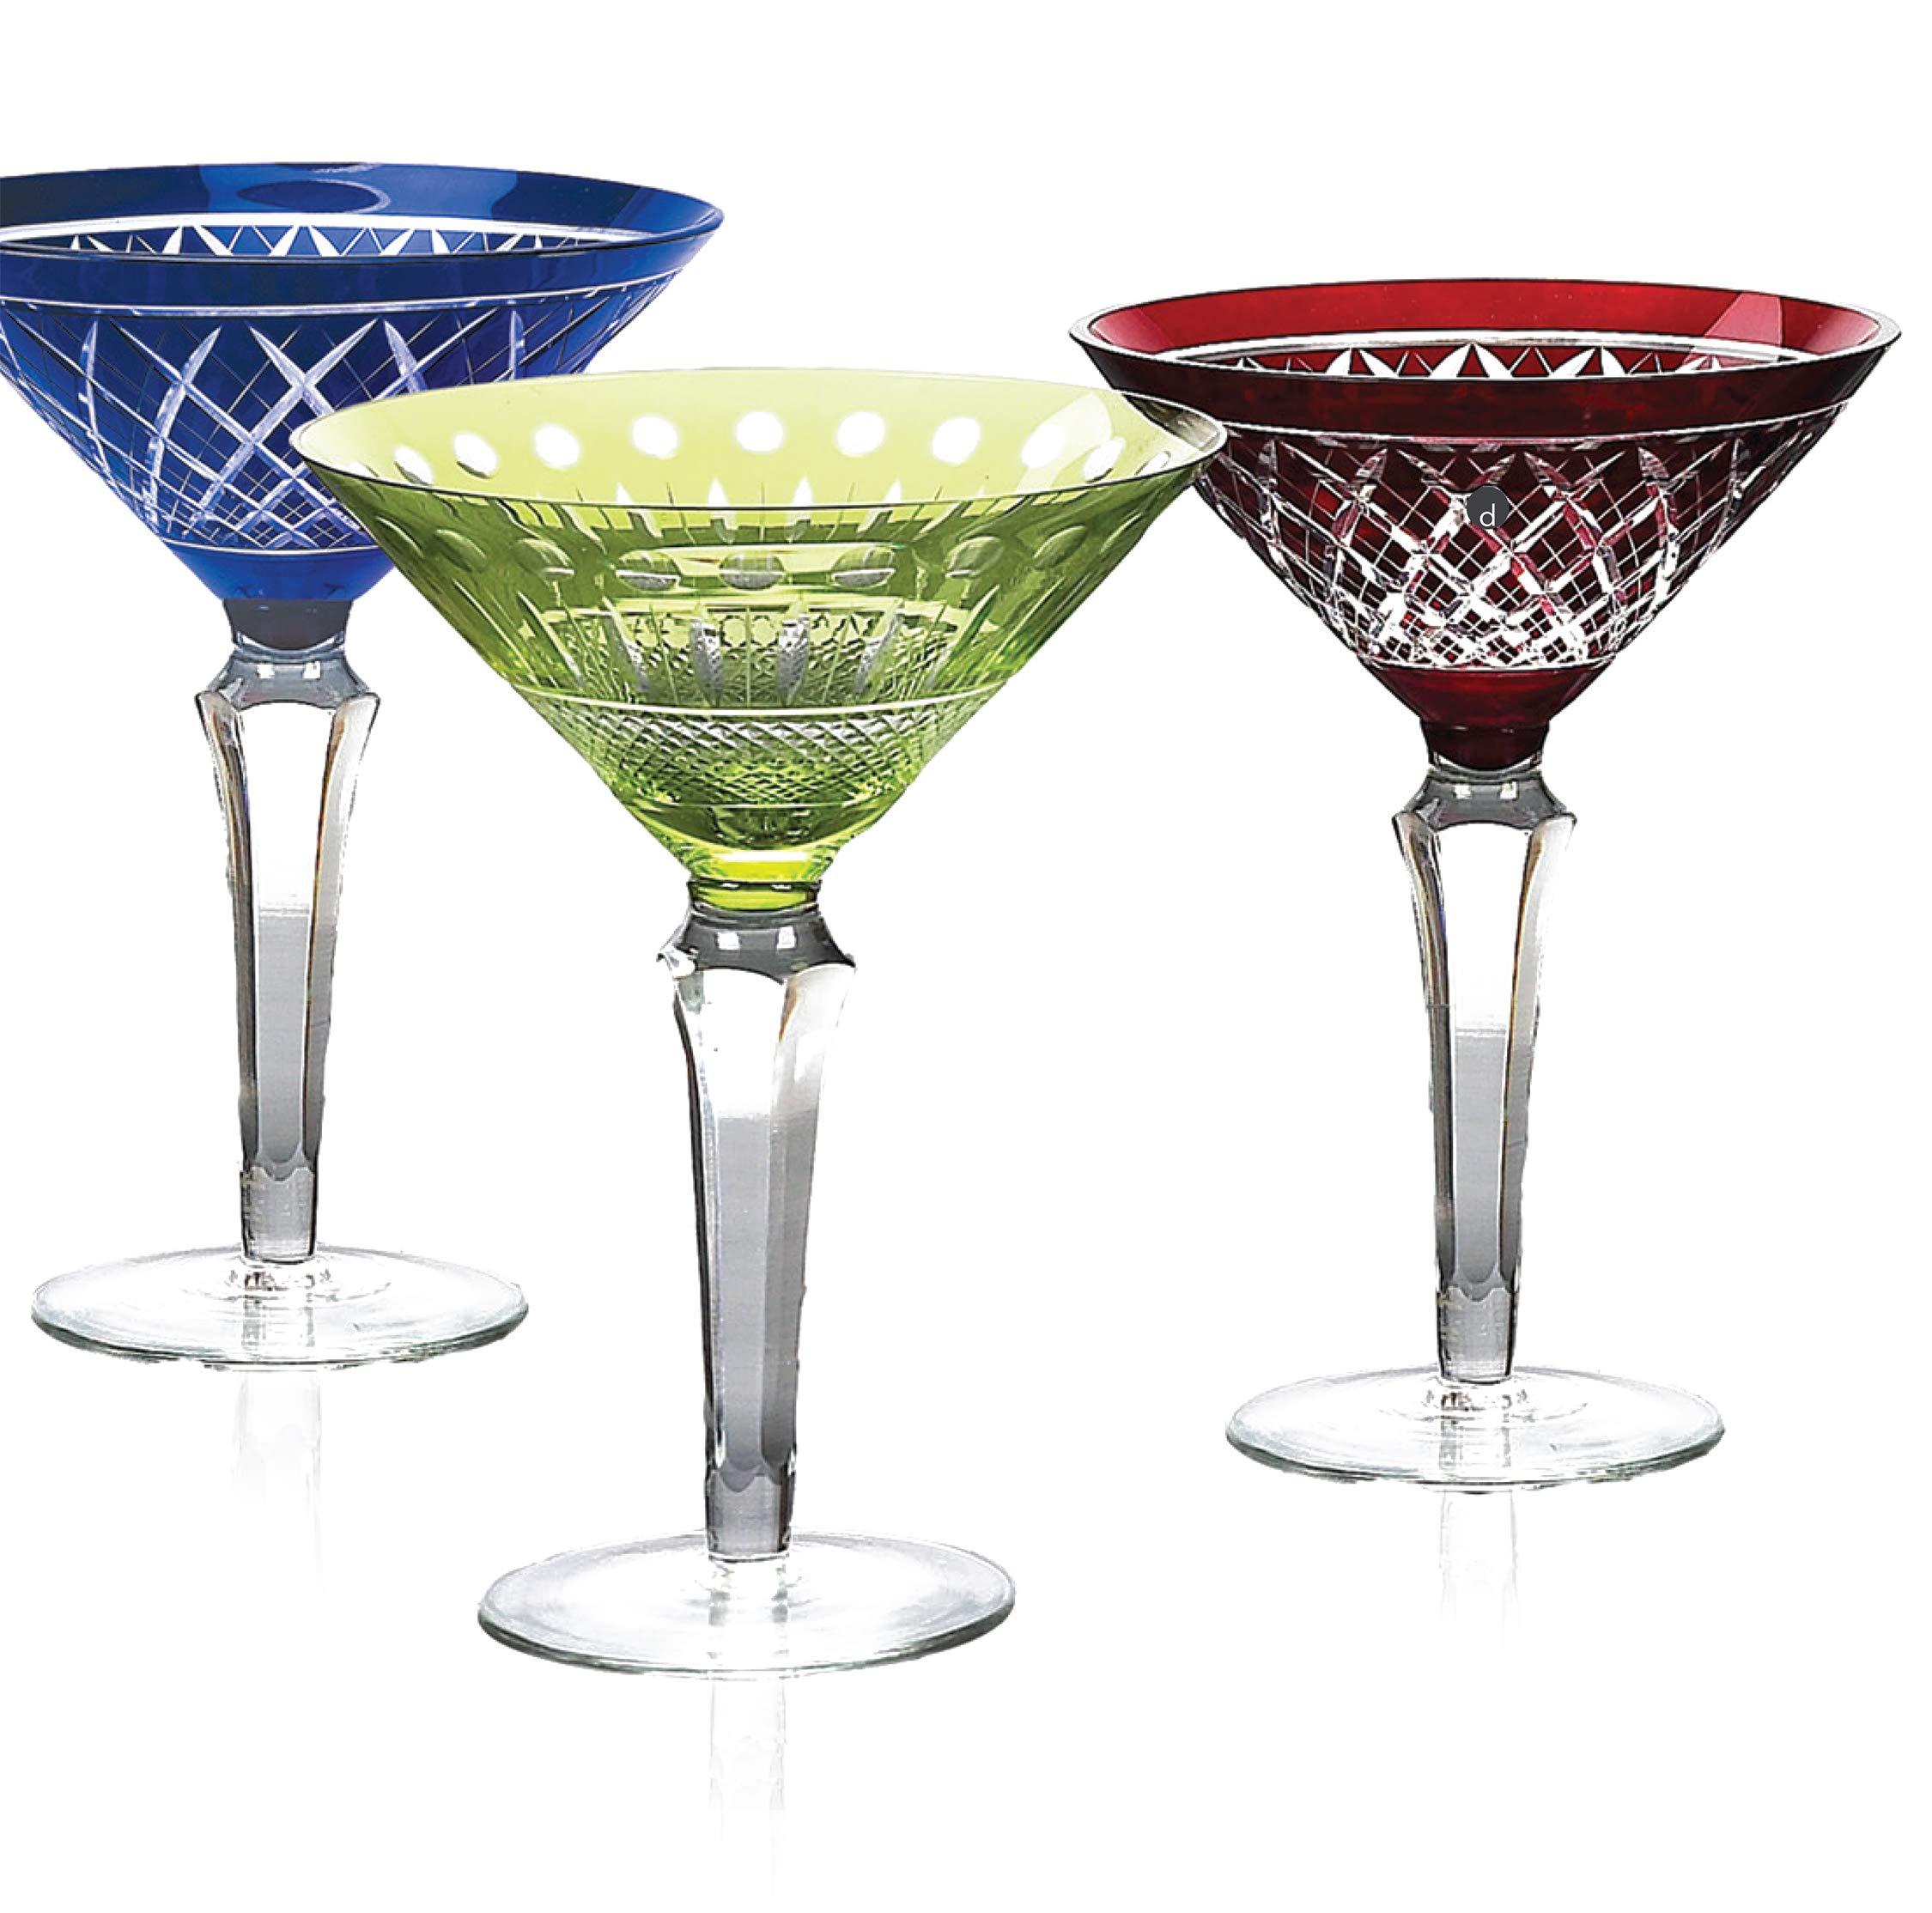 IMPULSE! Glam Martini Cobalt Blue Martini Glasses, Set of 6